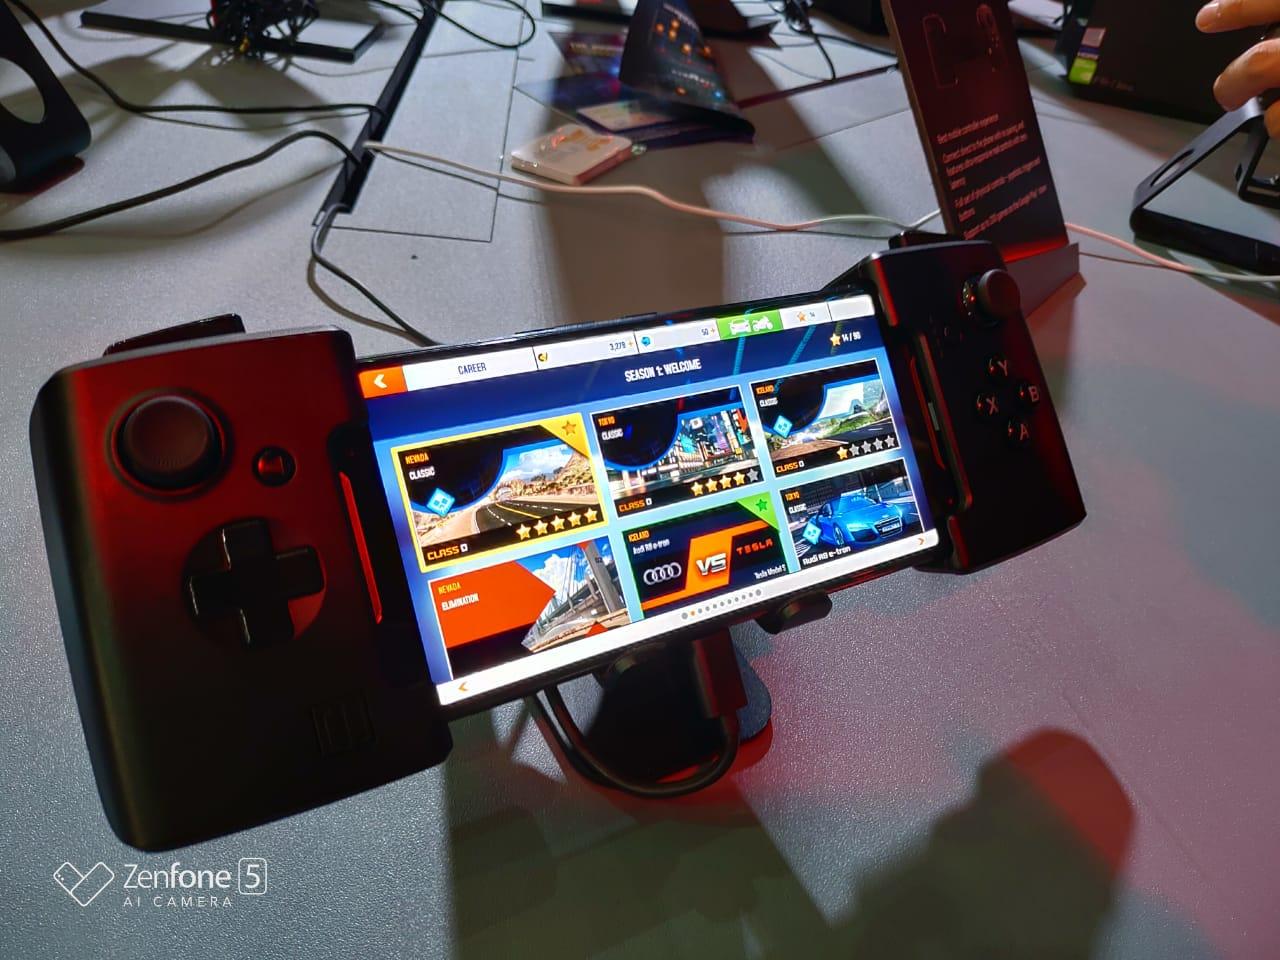 ROG Phone Asus Dibanderol Belasan Juta, Kemahalan Nggak sih?